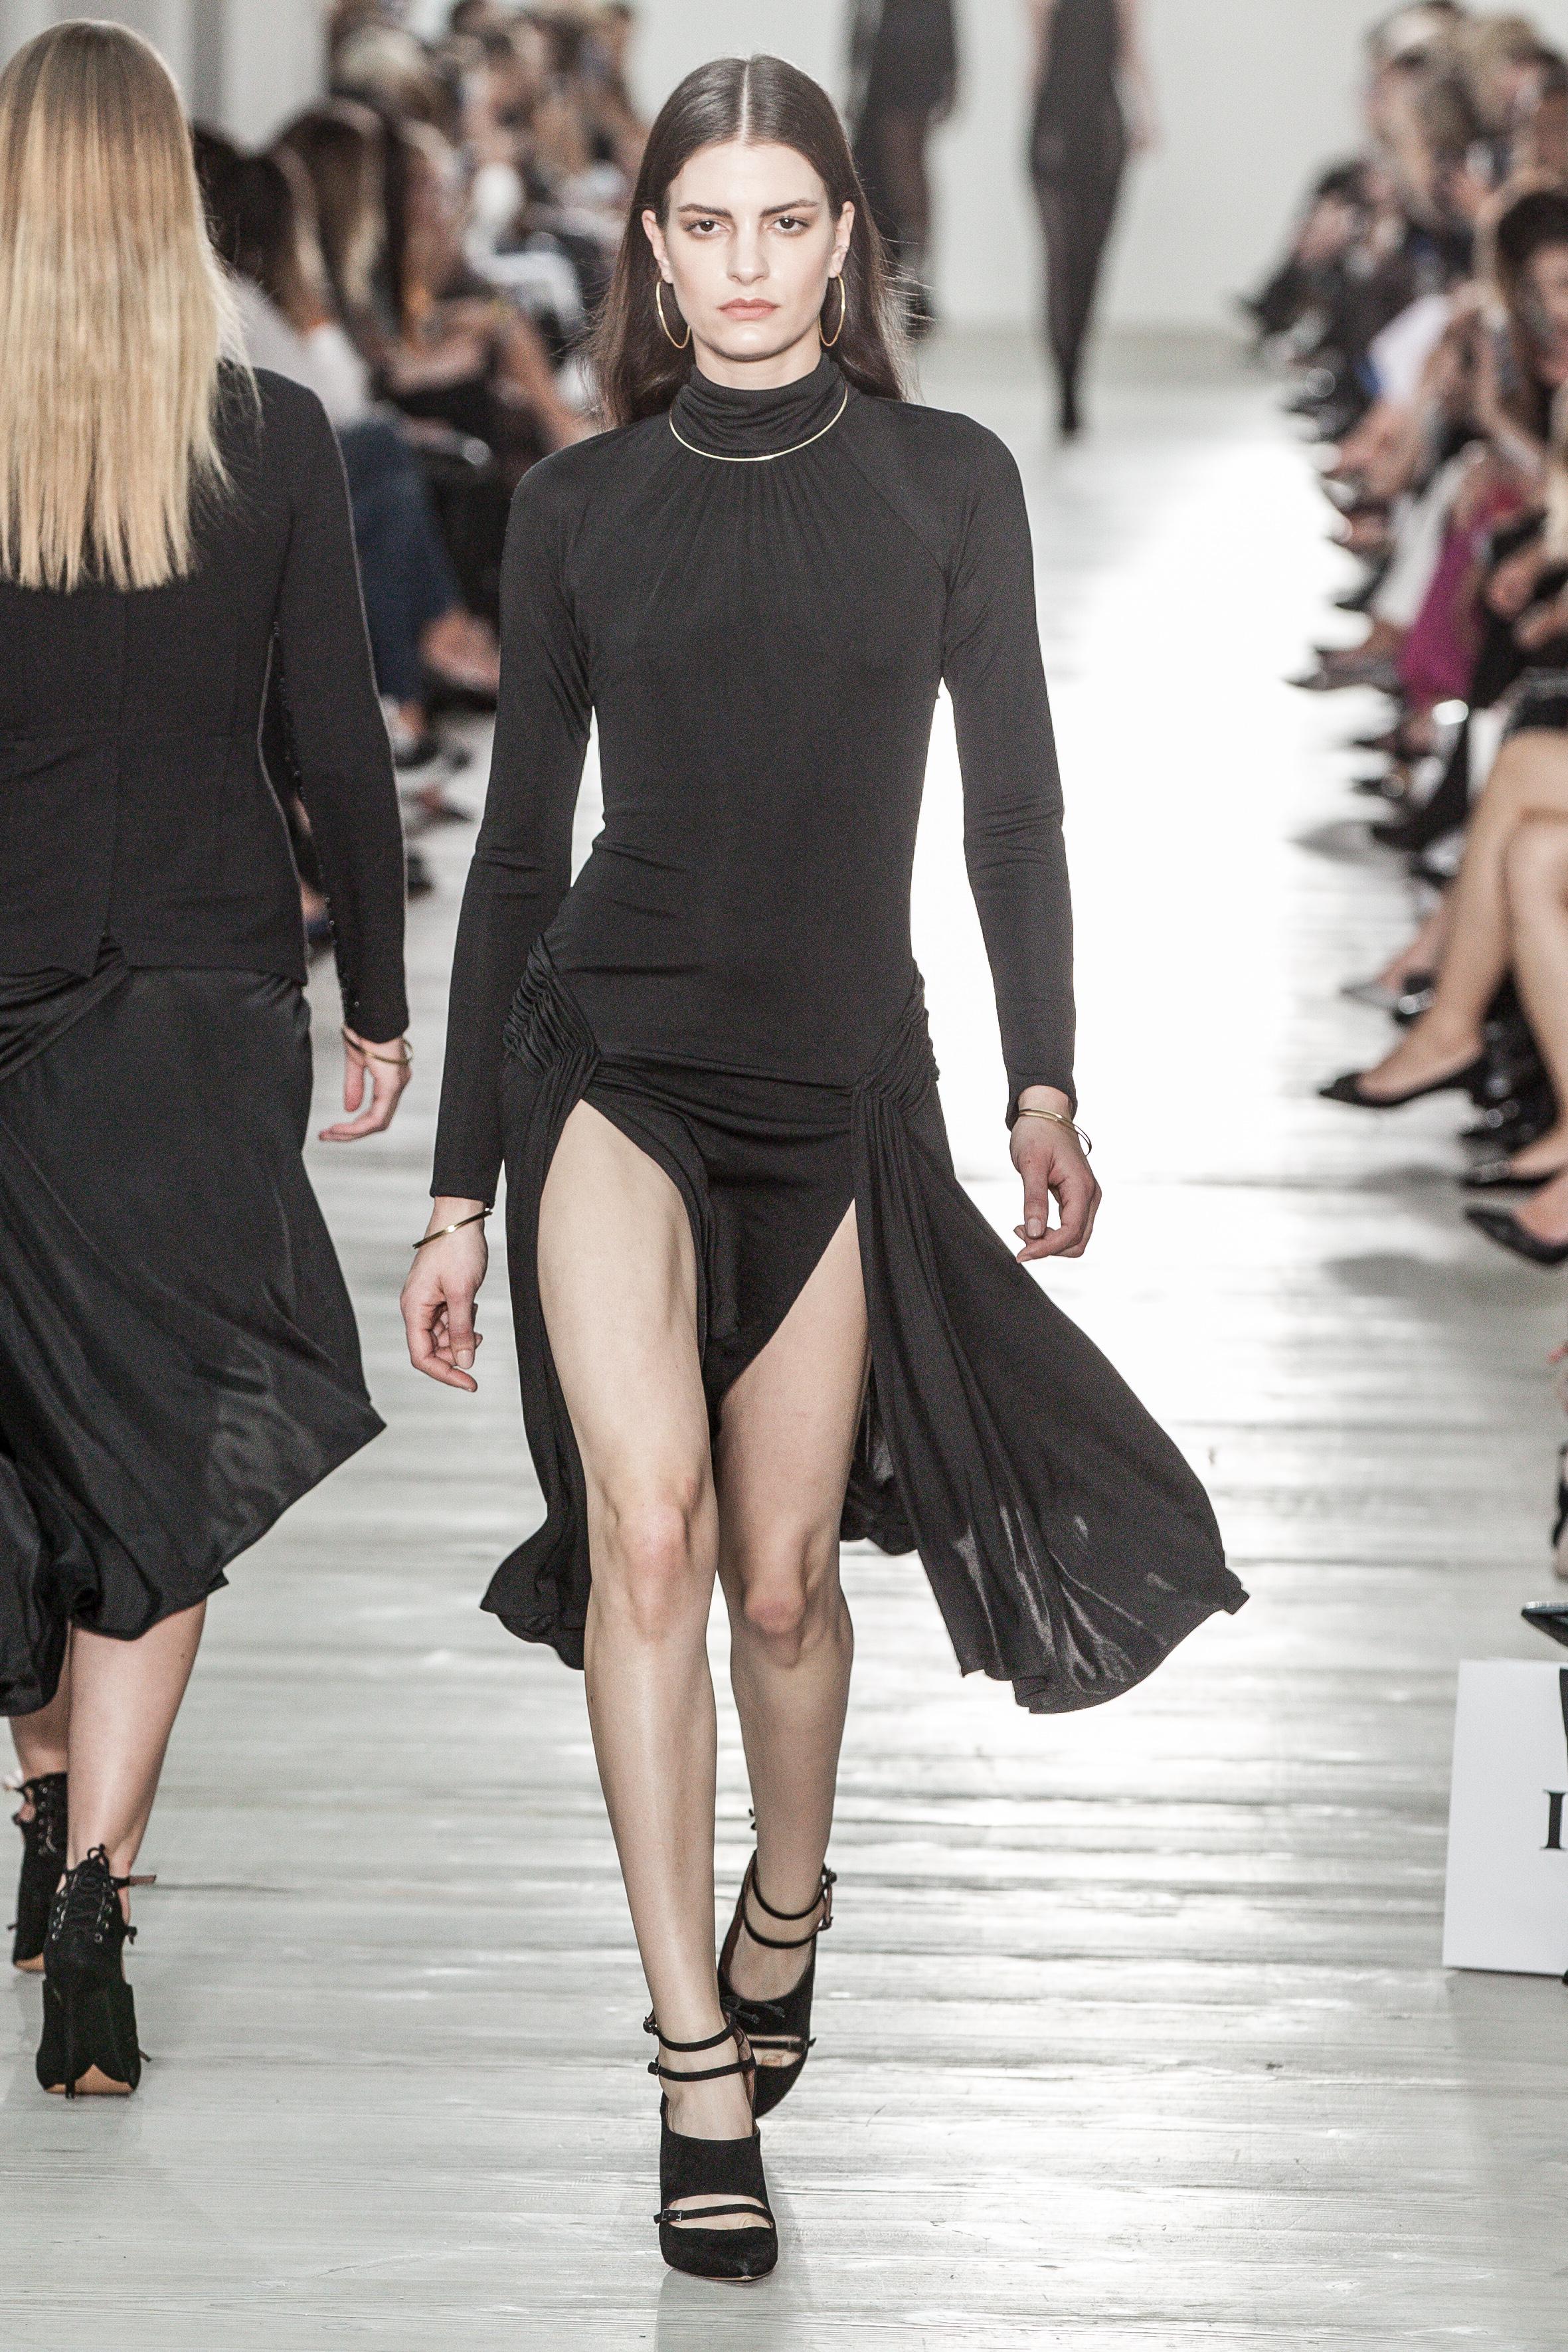 London_Fashion_Week_by_Sam_Geals_InlineSix_Photography0057.jpg